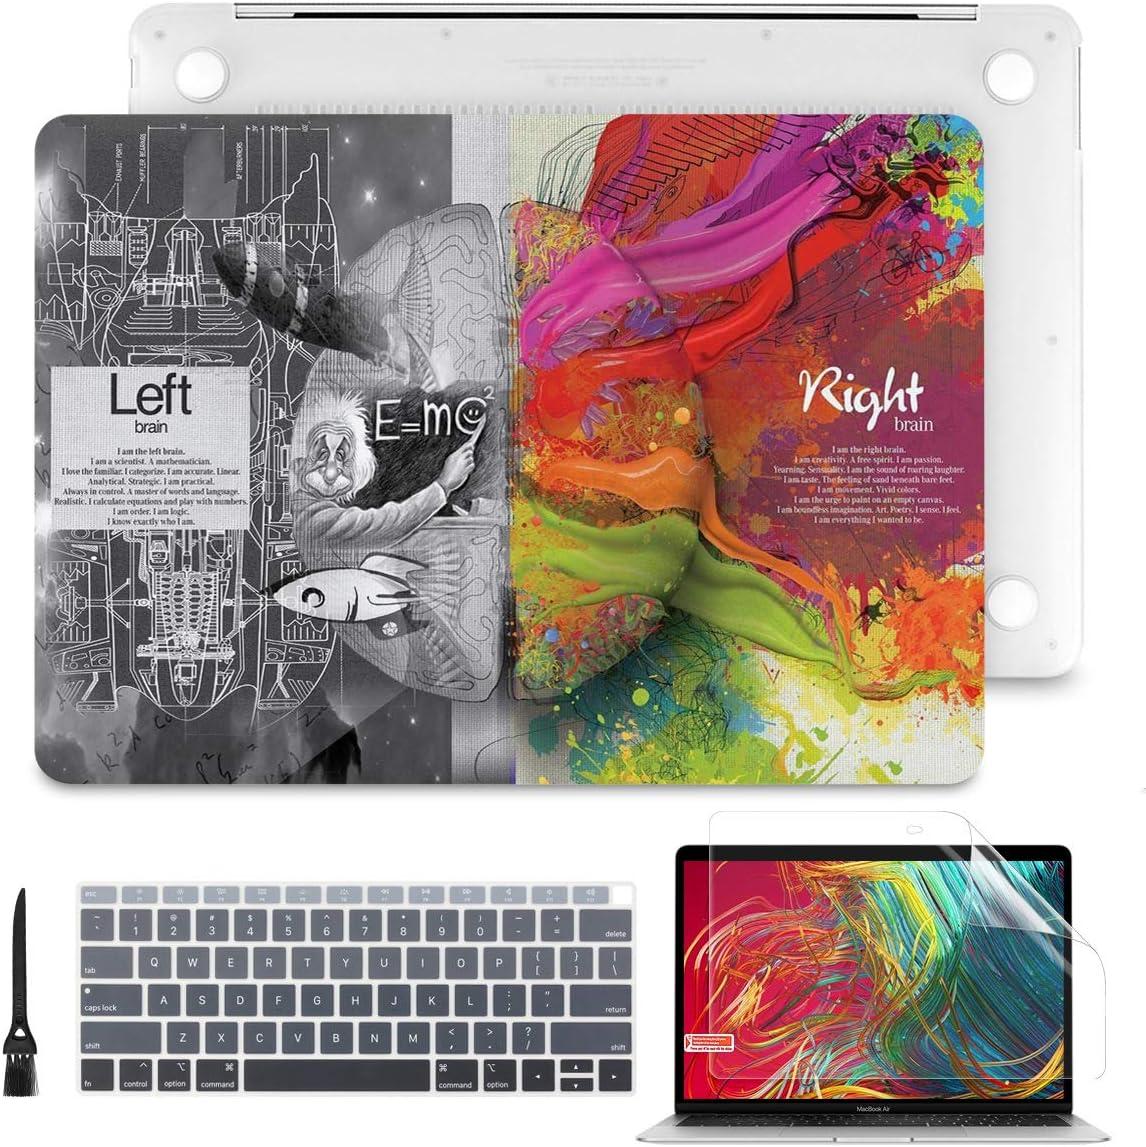 Batianda Laptop Case for MacBook Pro 2016 2018 2017 13